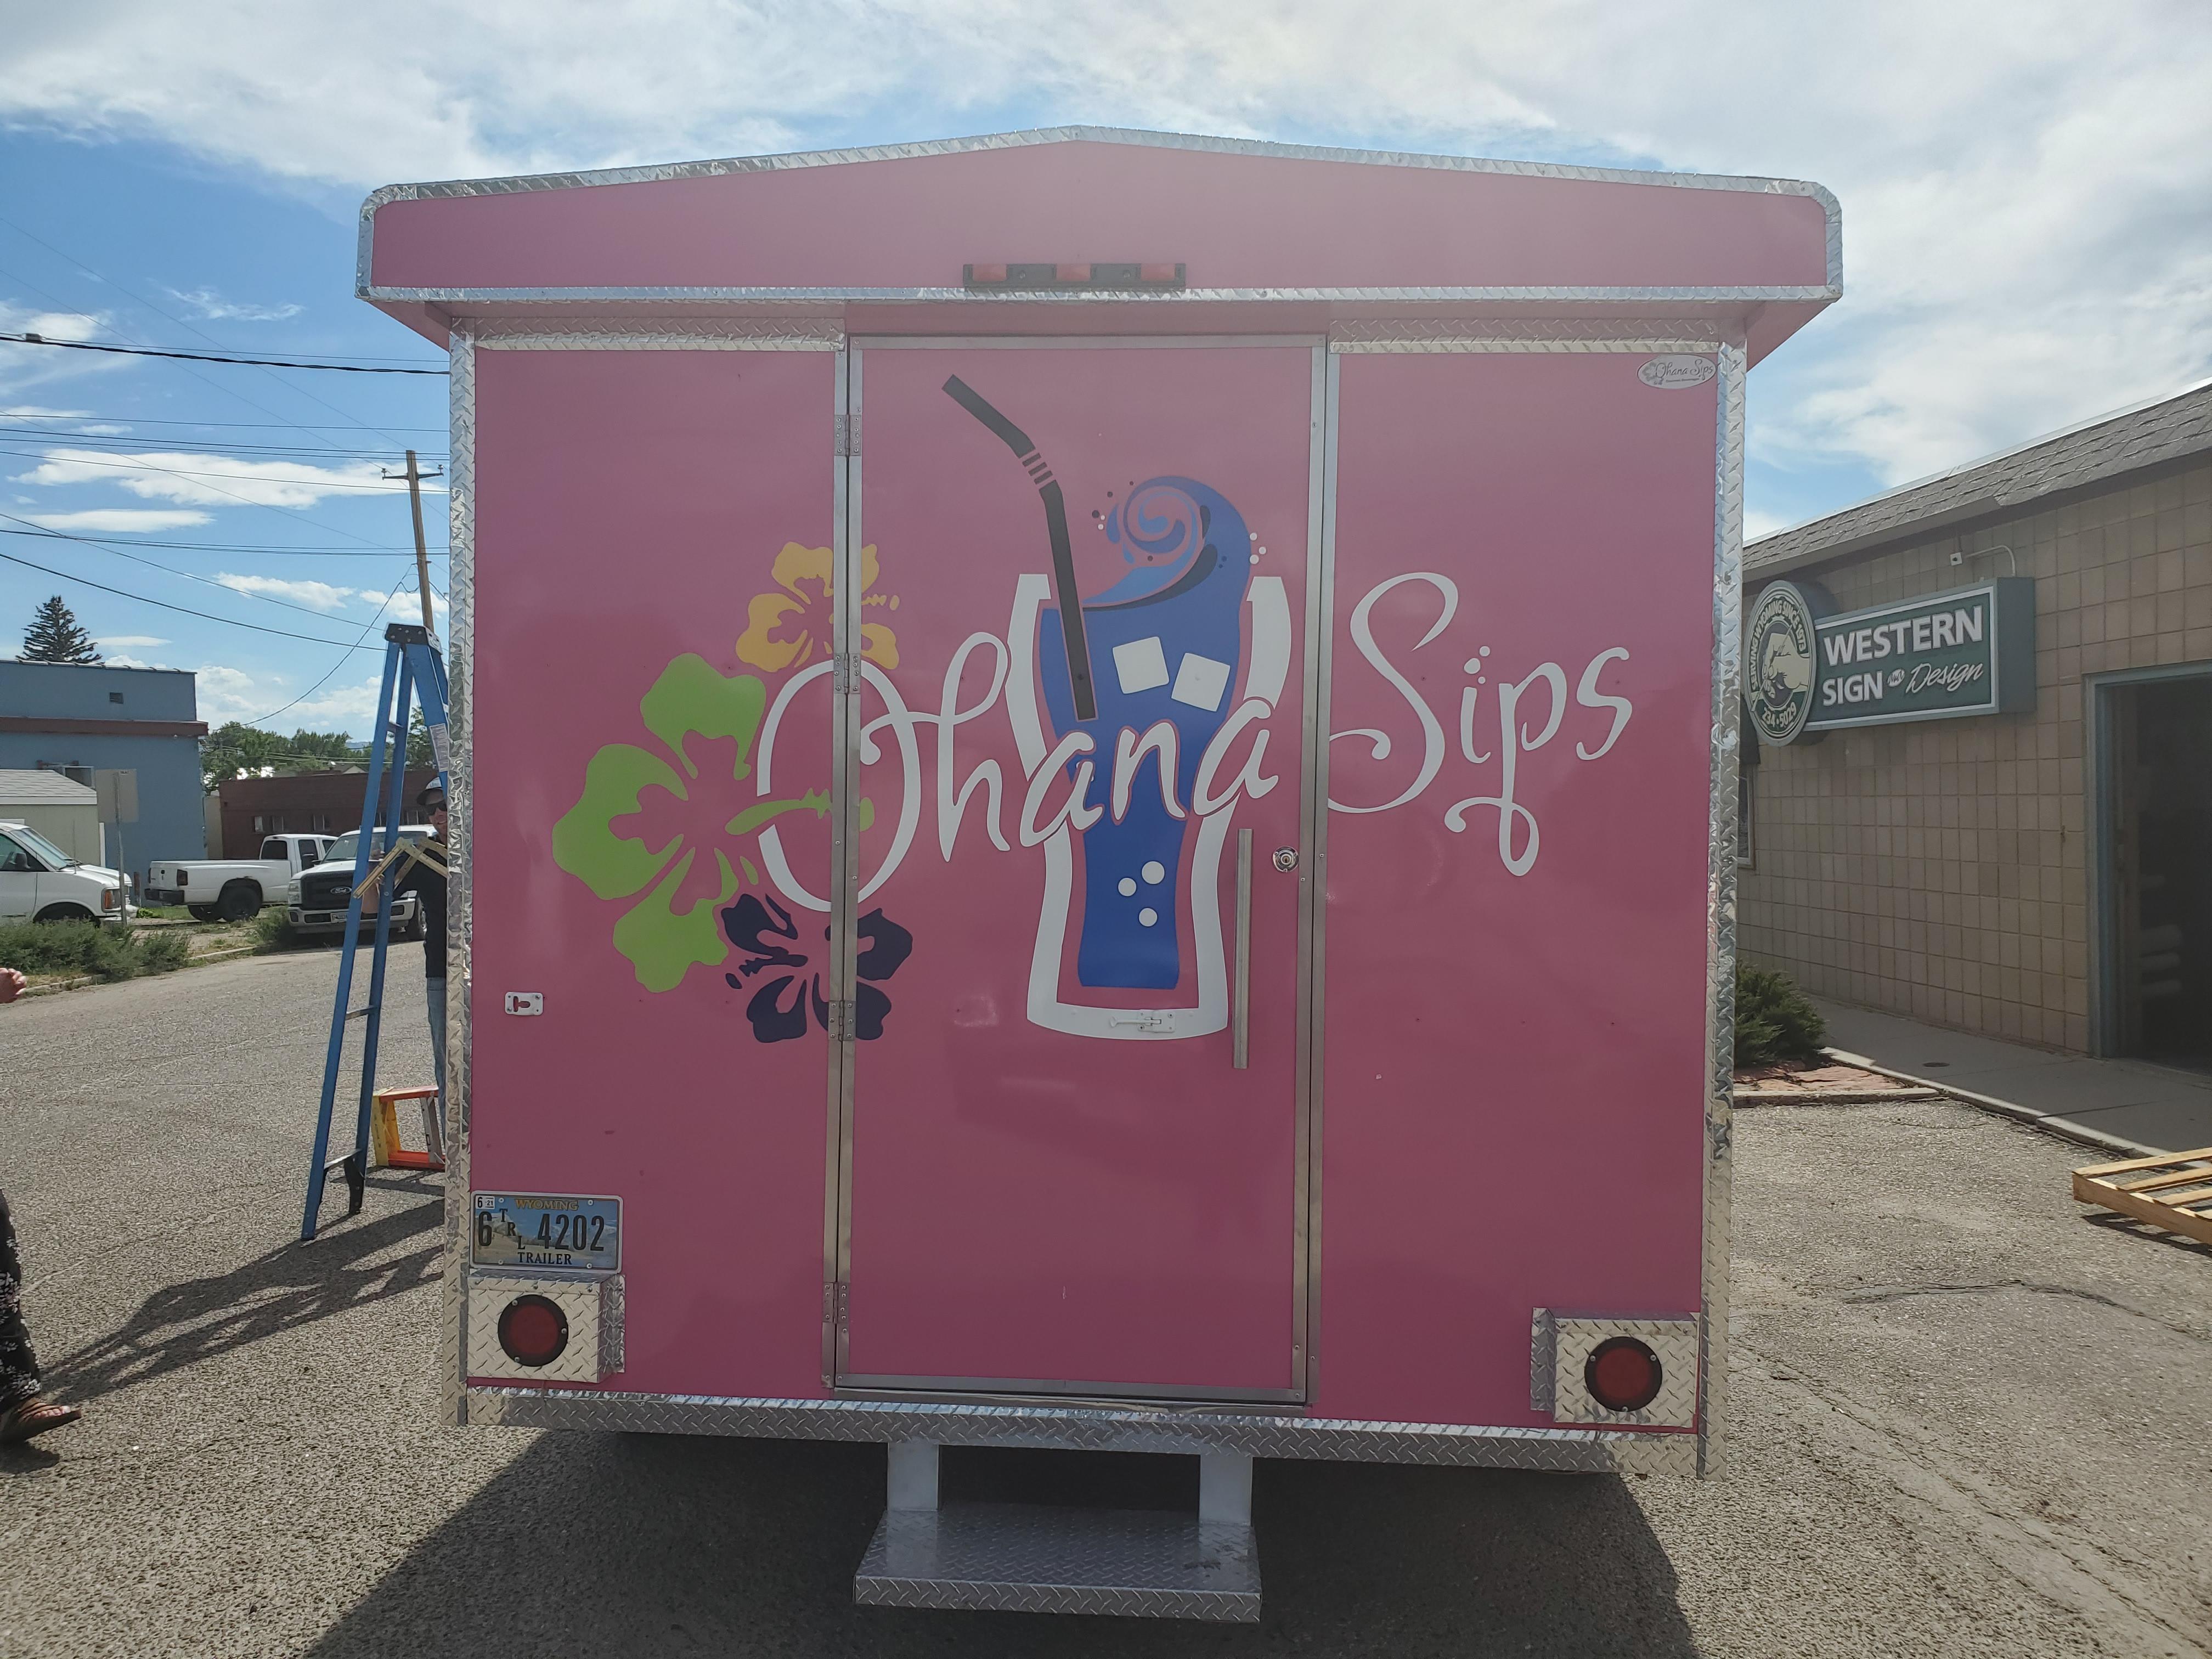 Food truck trailer decals, wyoming